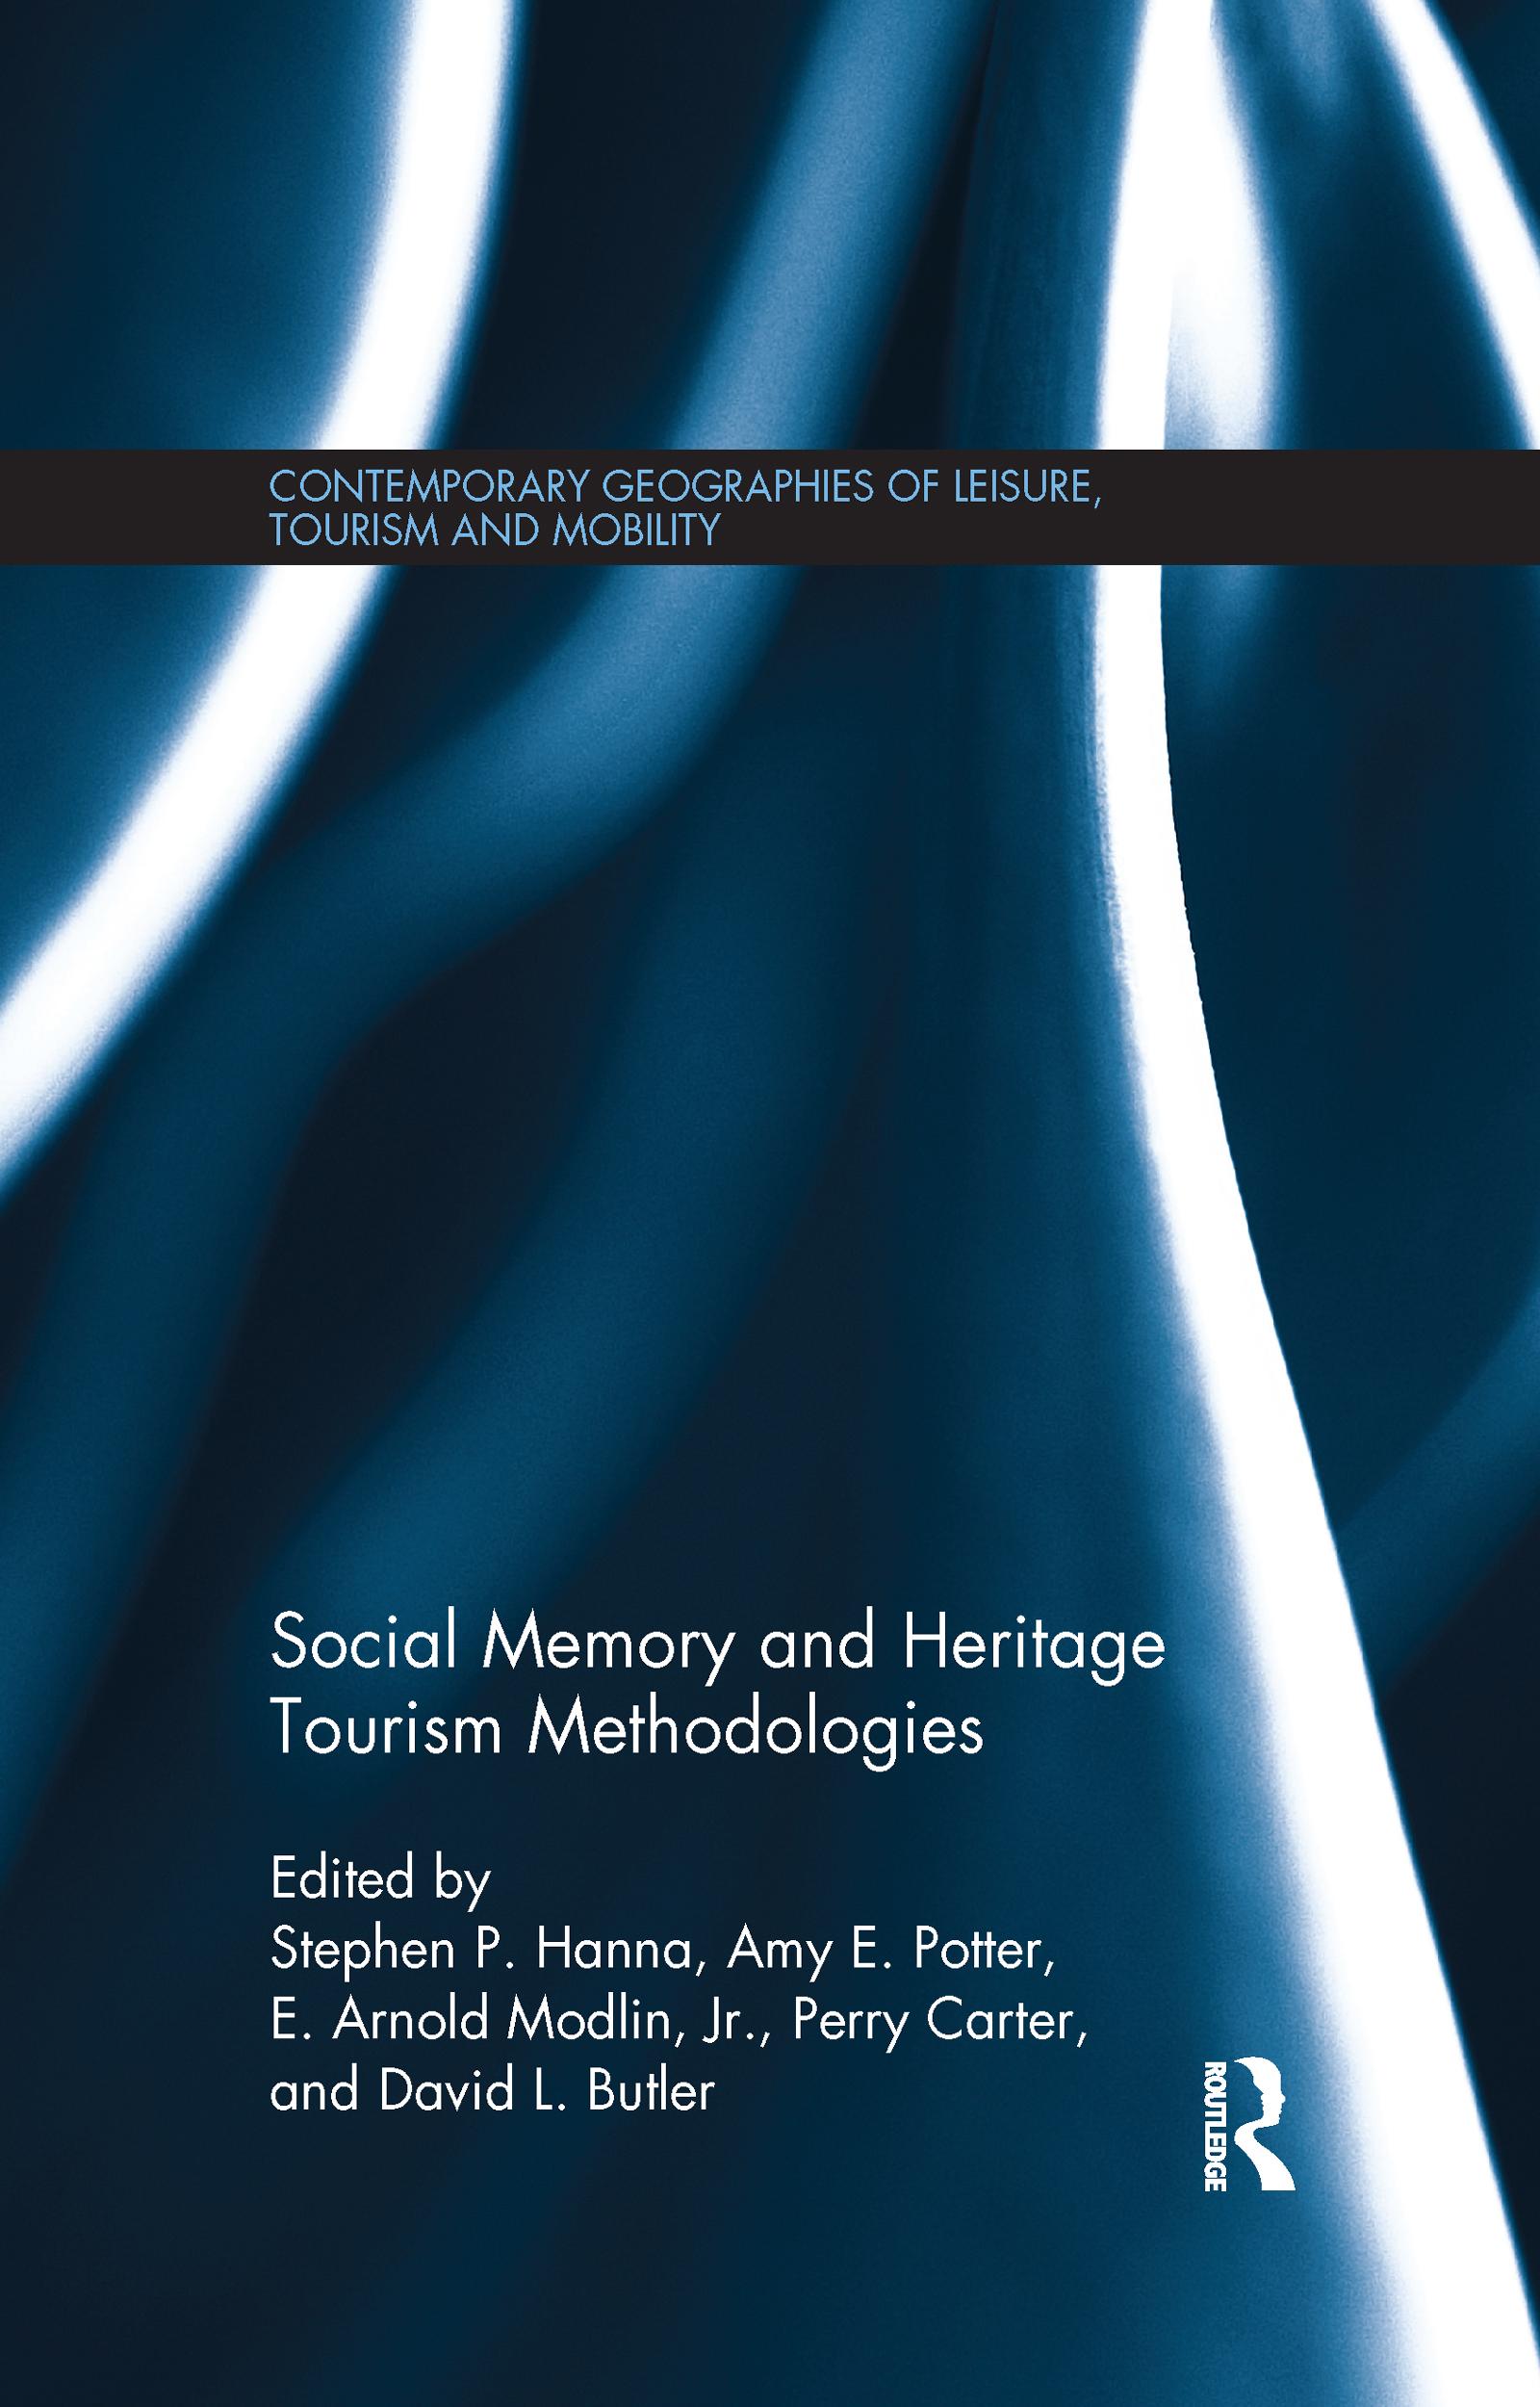 Social Memory and Heritage Tourism Methodologies